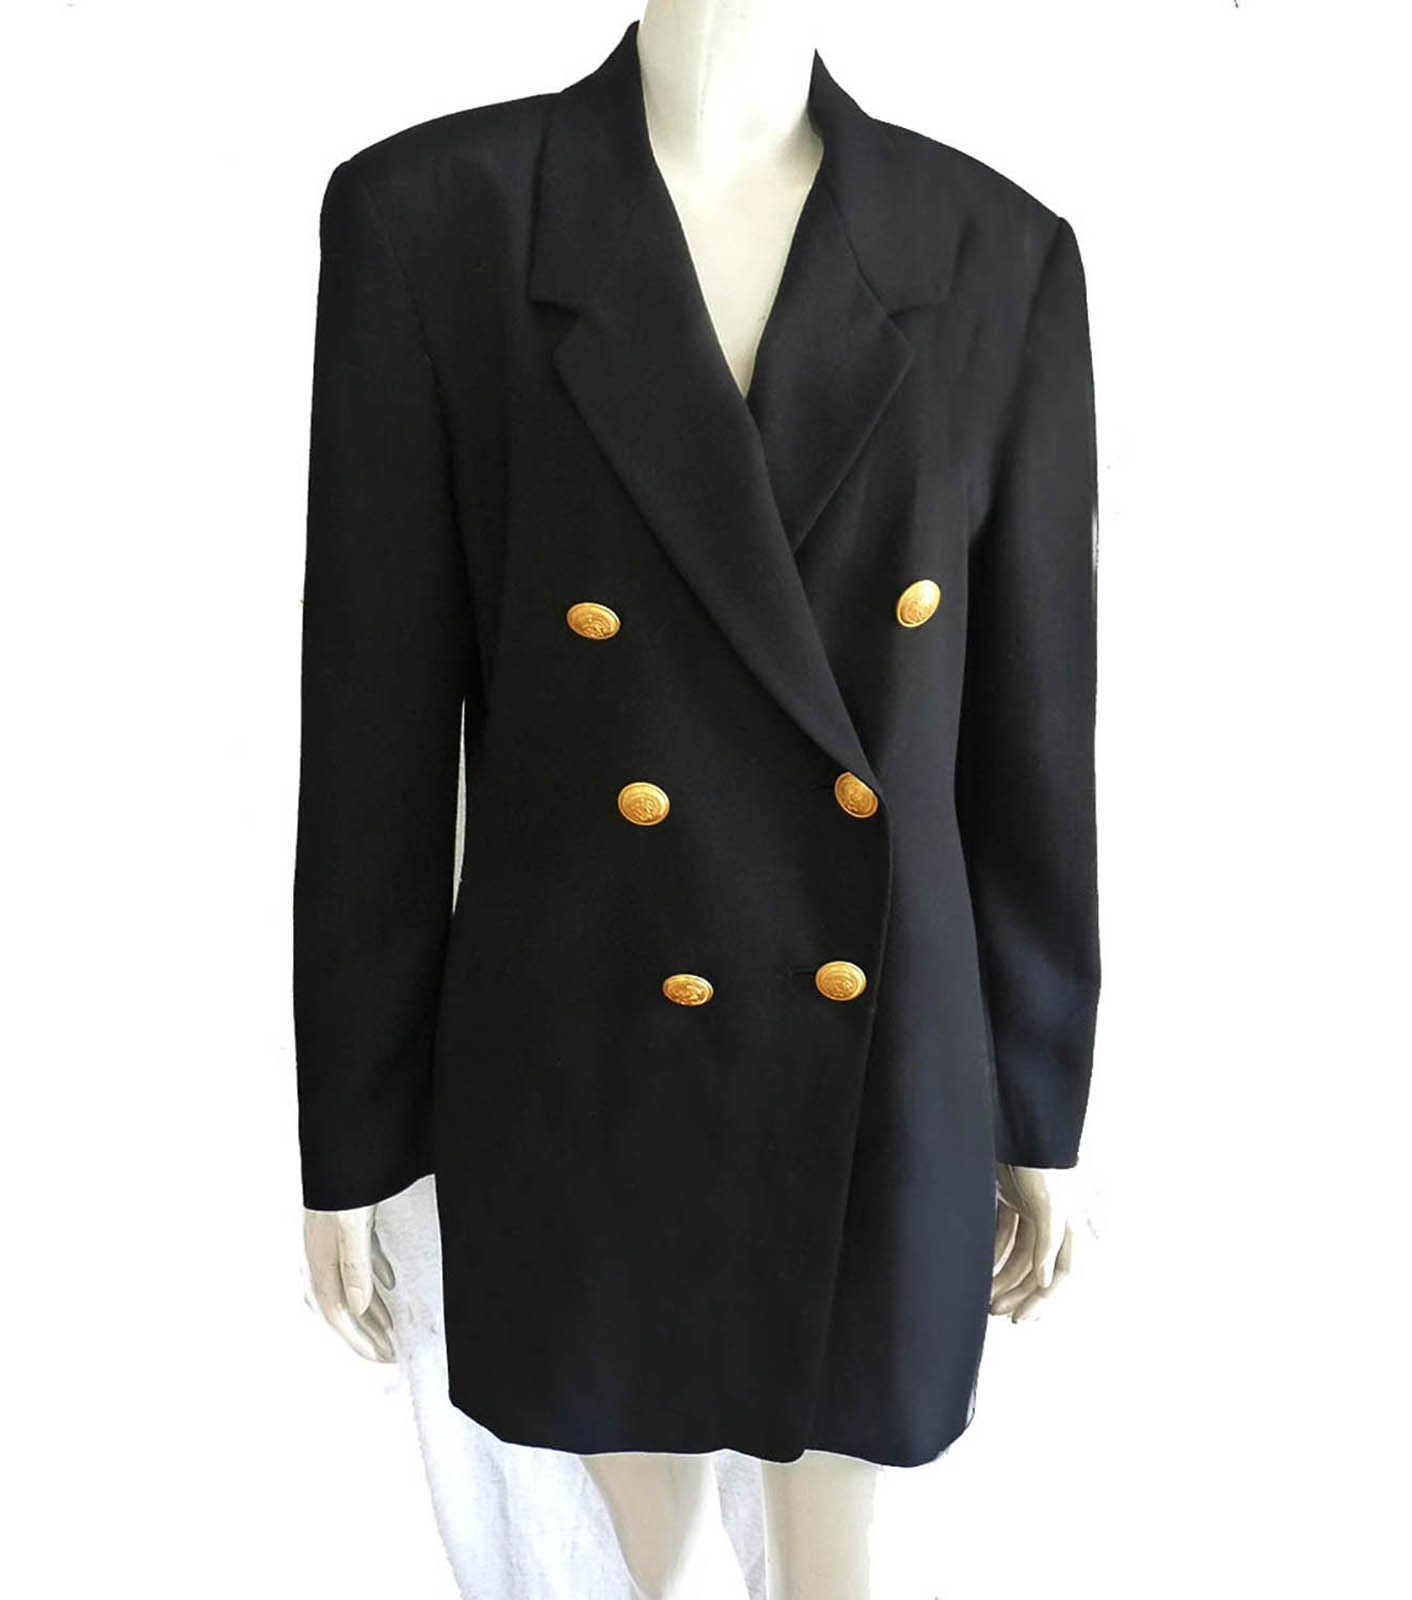 MONDI FASHION BLAZER JACKET COAT Black Gold Buttons Size 6 36